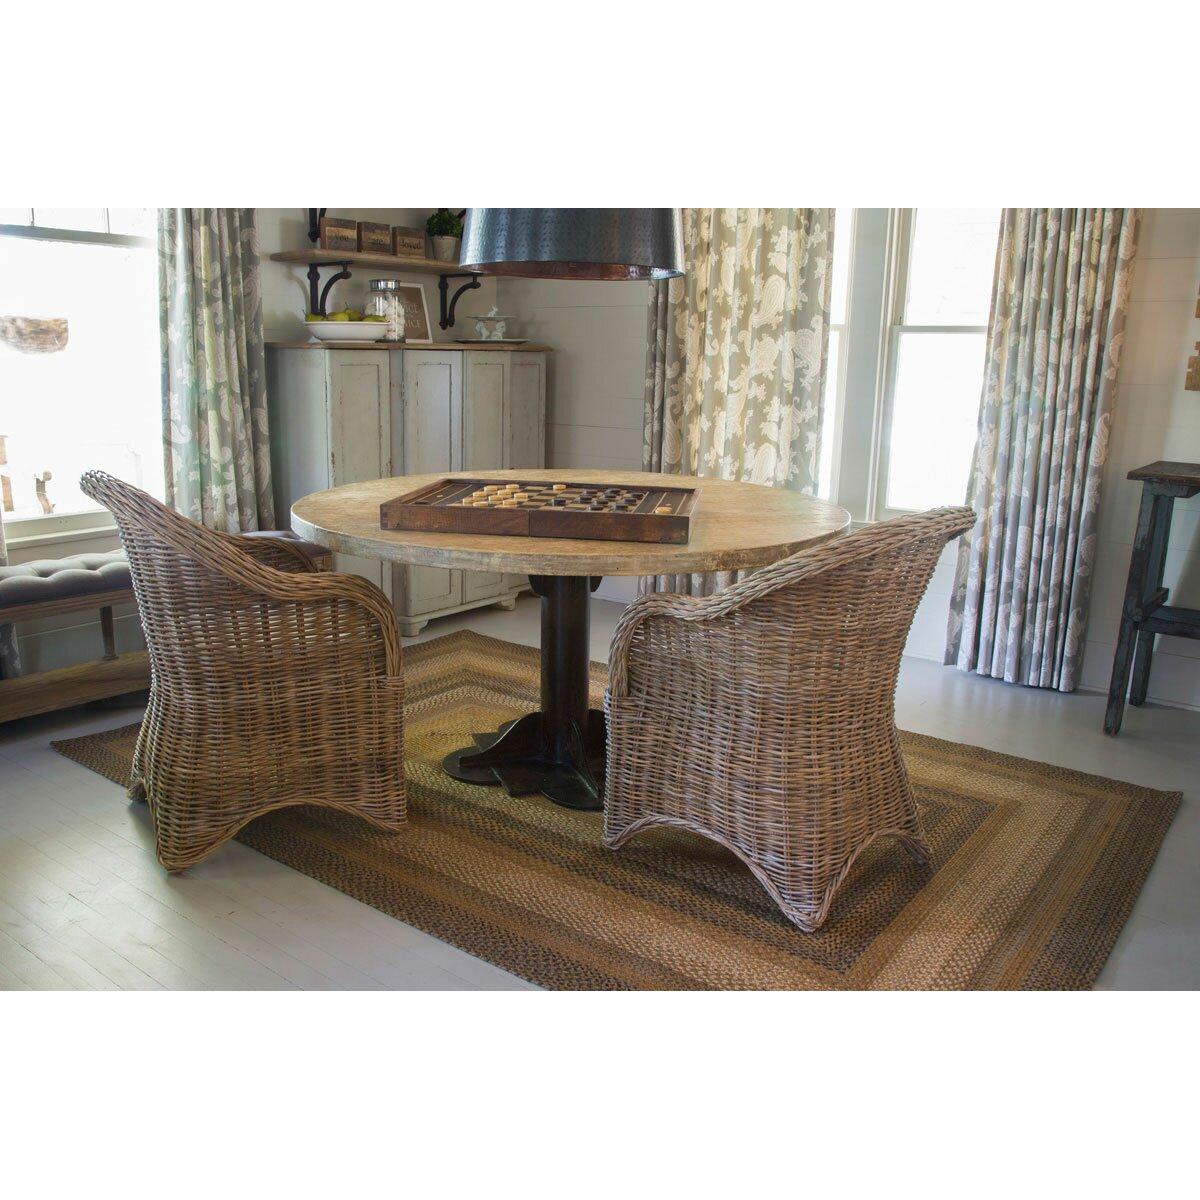 Homespice Decor Coffee Area Rug Reviews Wayfair